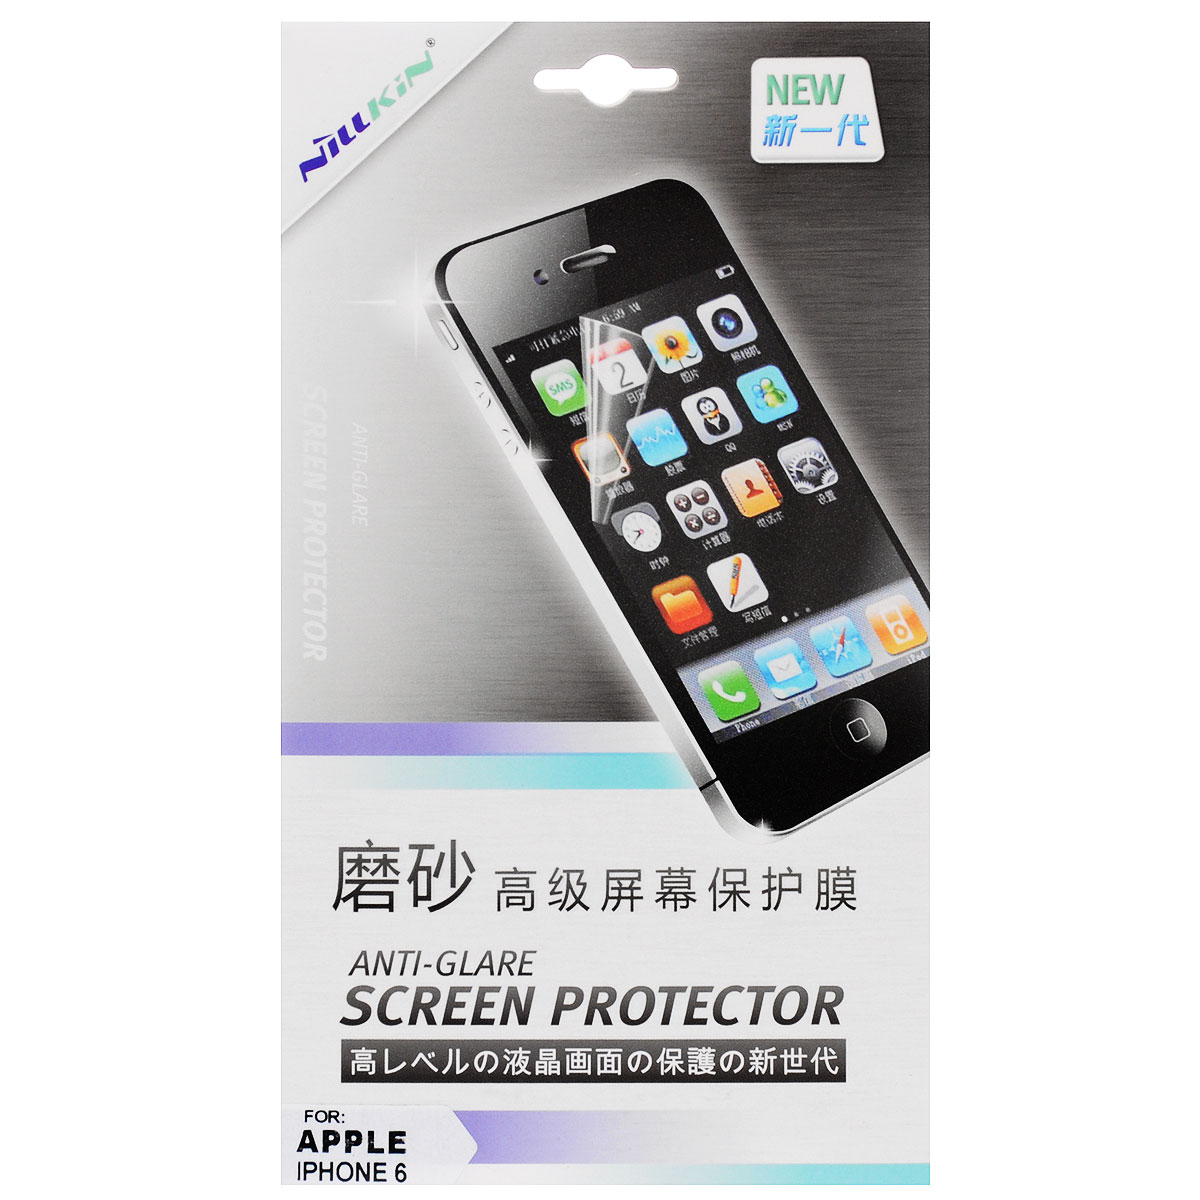 Nillkin Screen Protector защитная пленка для Apple iPhone 6, матовая